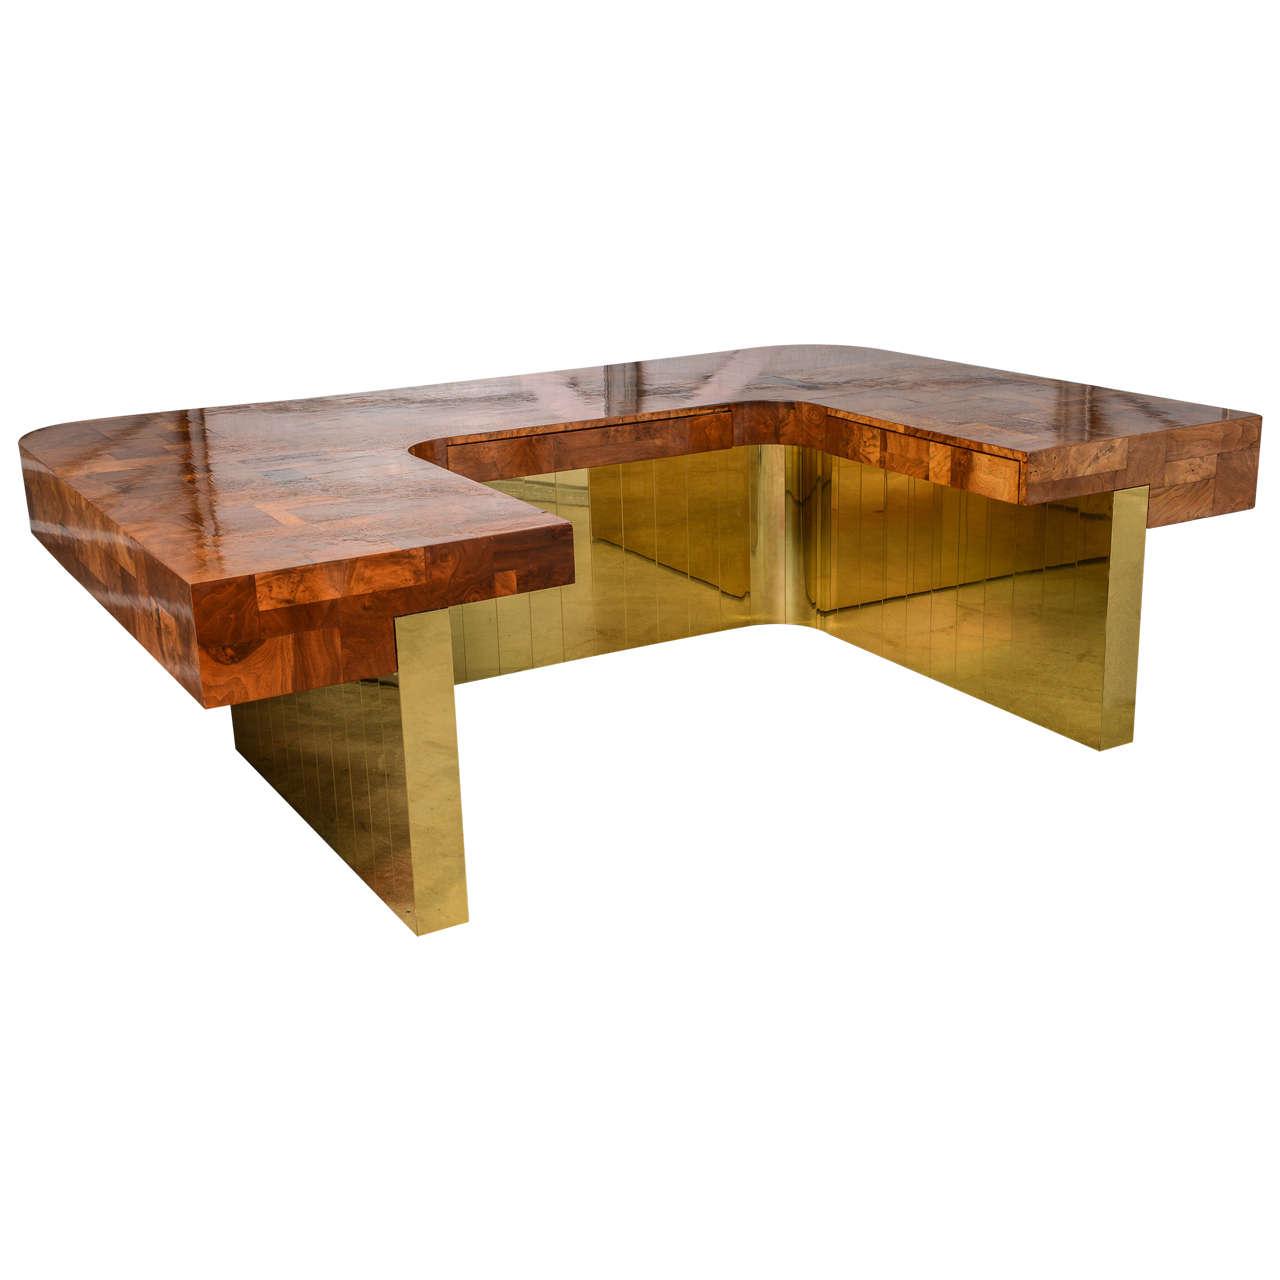 Very Rare Brass Bottom Directional Cityscape Desk by Paul Evans